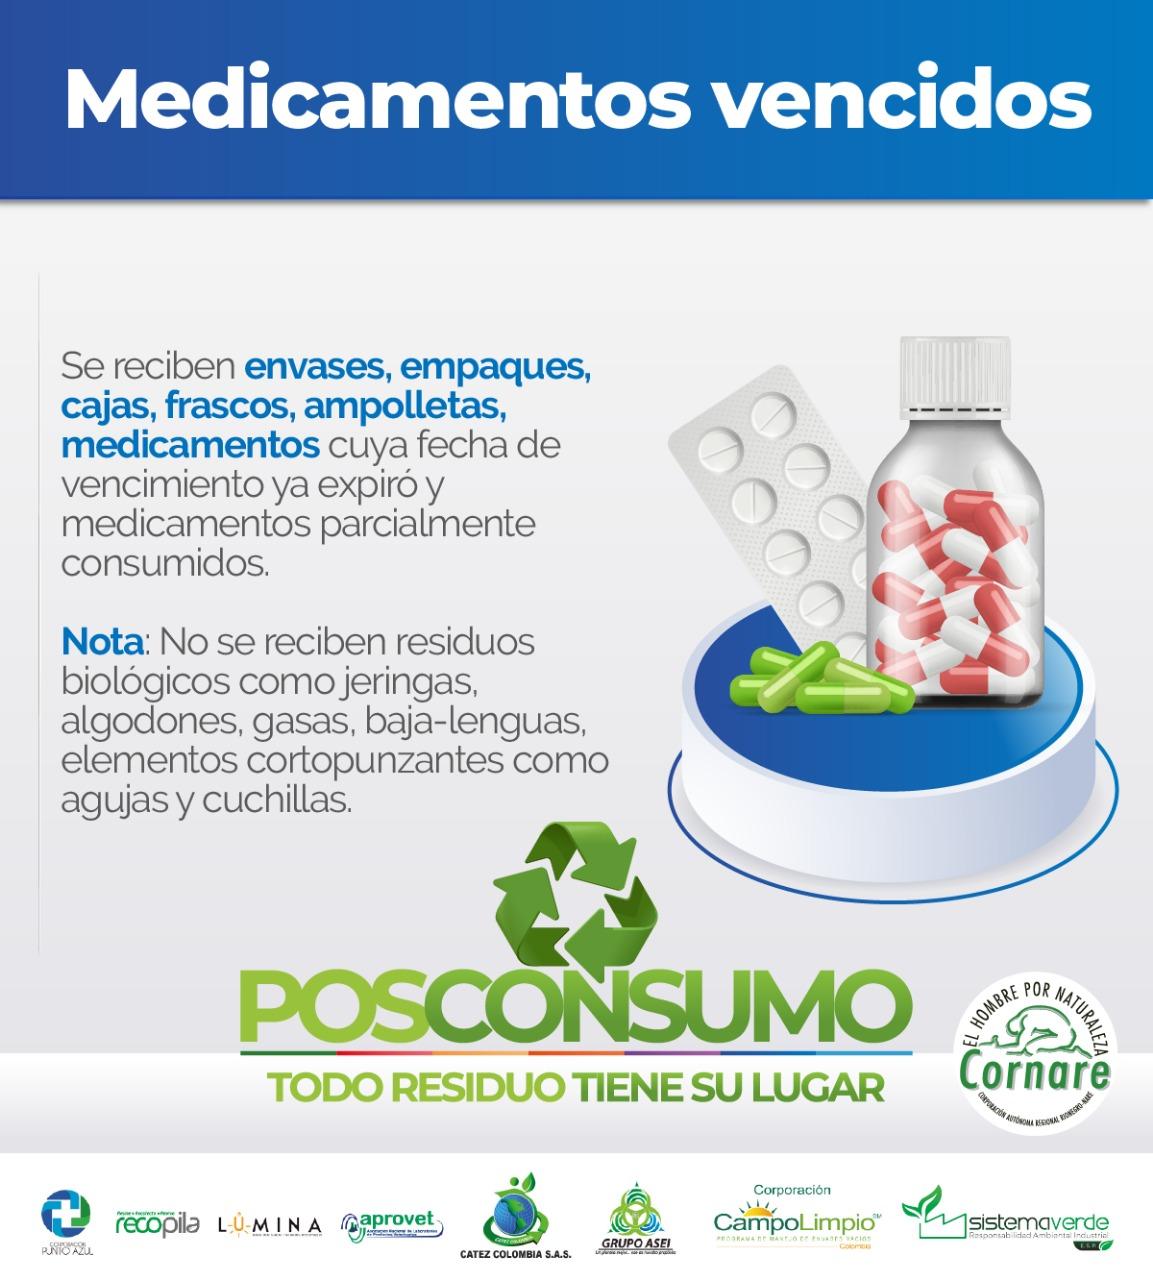 Medicamentos Posconnsumo